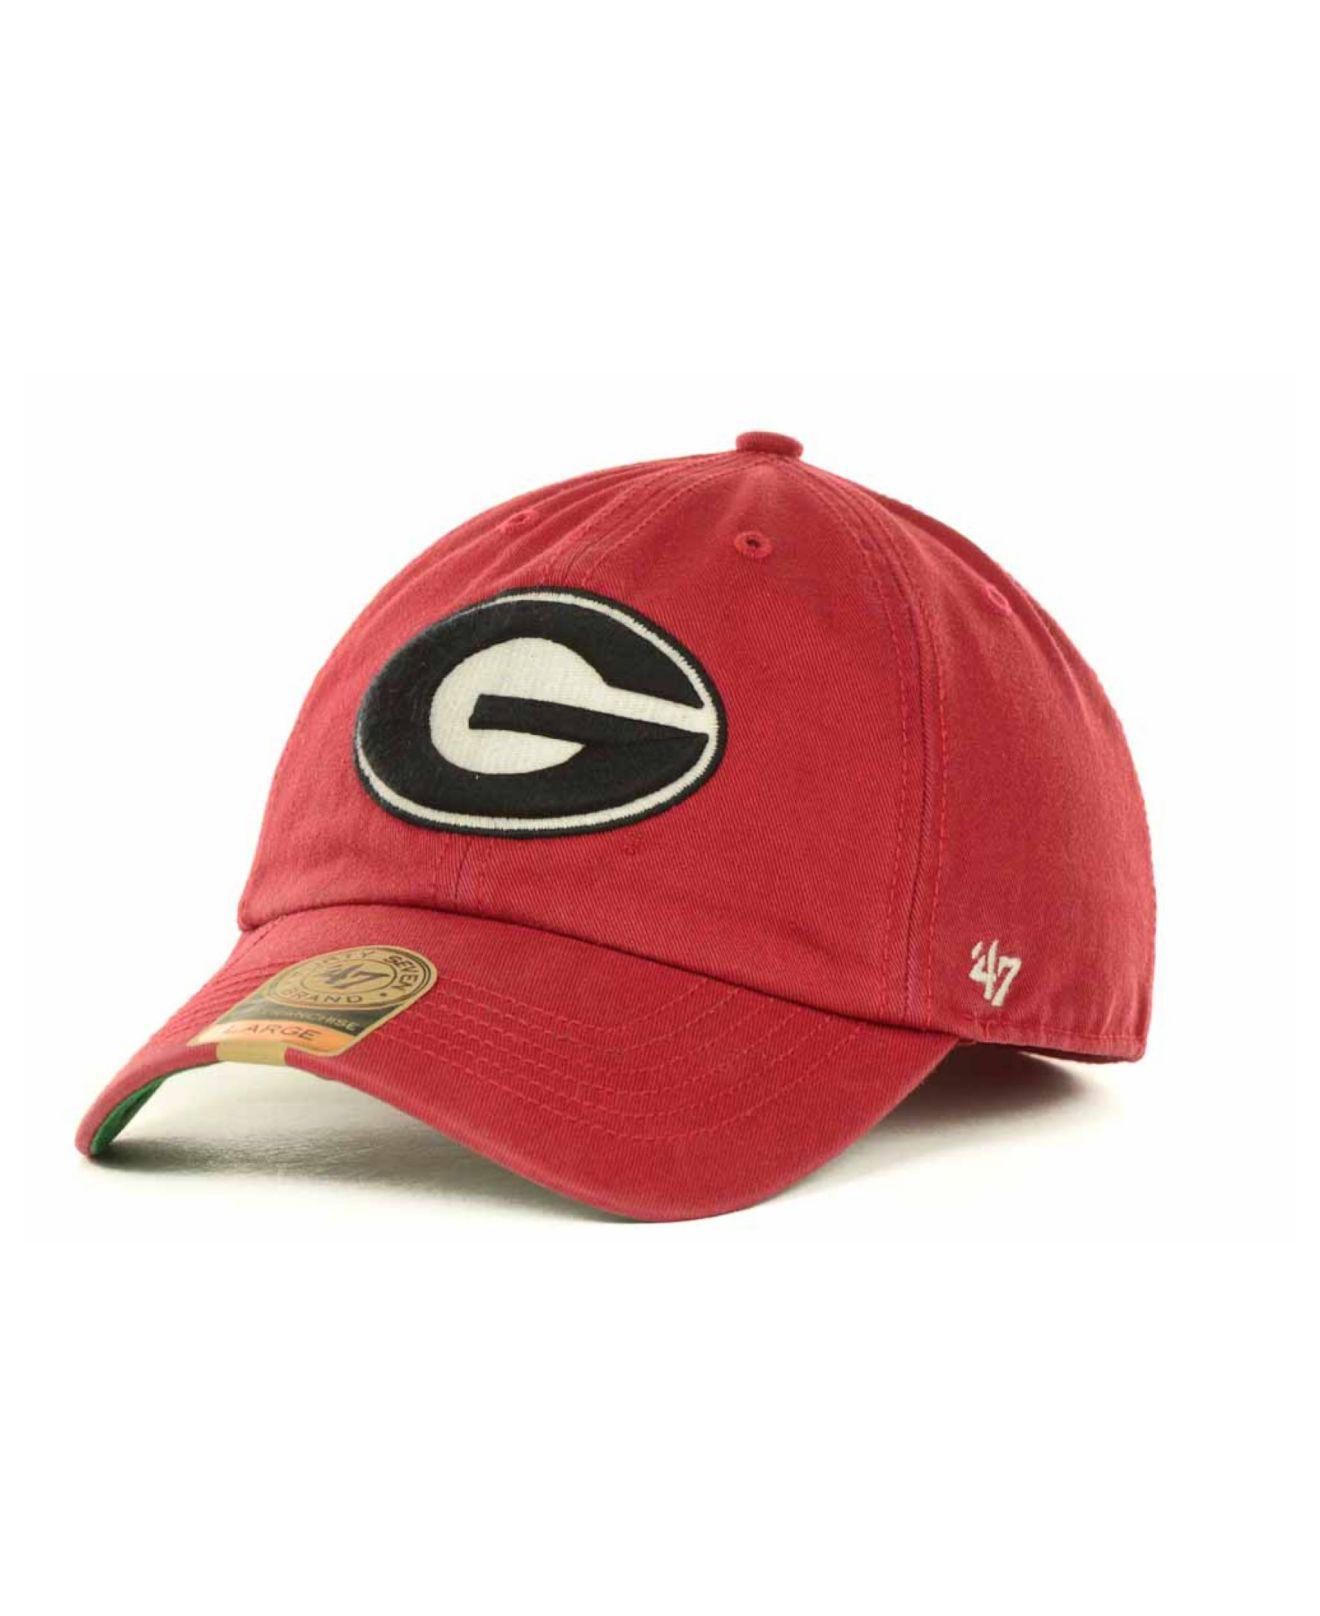 f4c4991556b Lyst - 47 Brand Georgia Bulldogs Franchise Cap in Red for Men